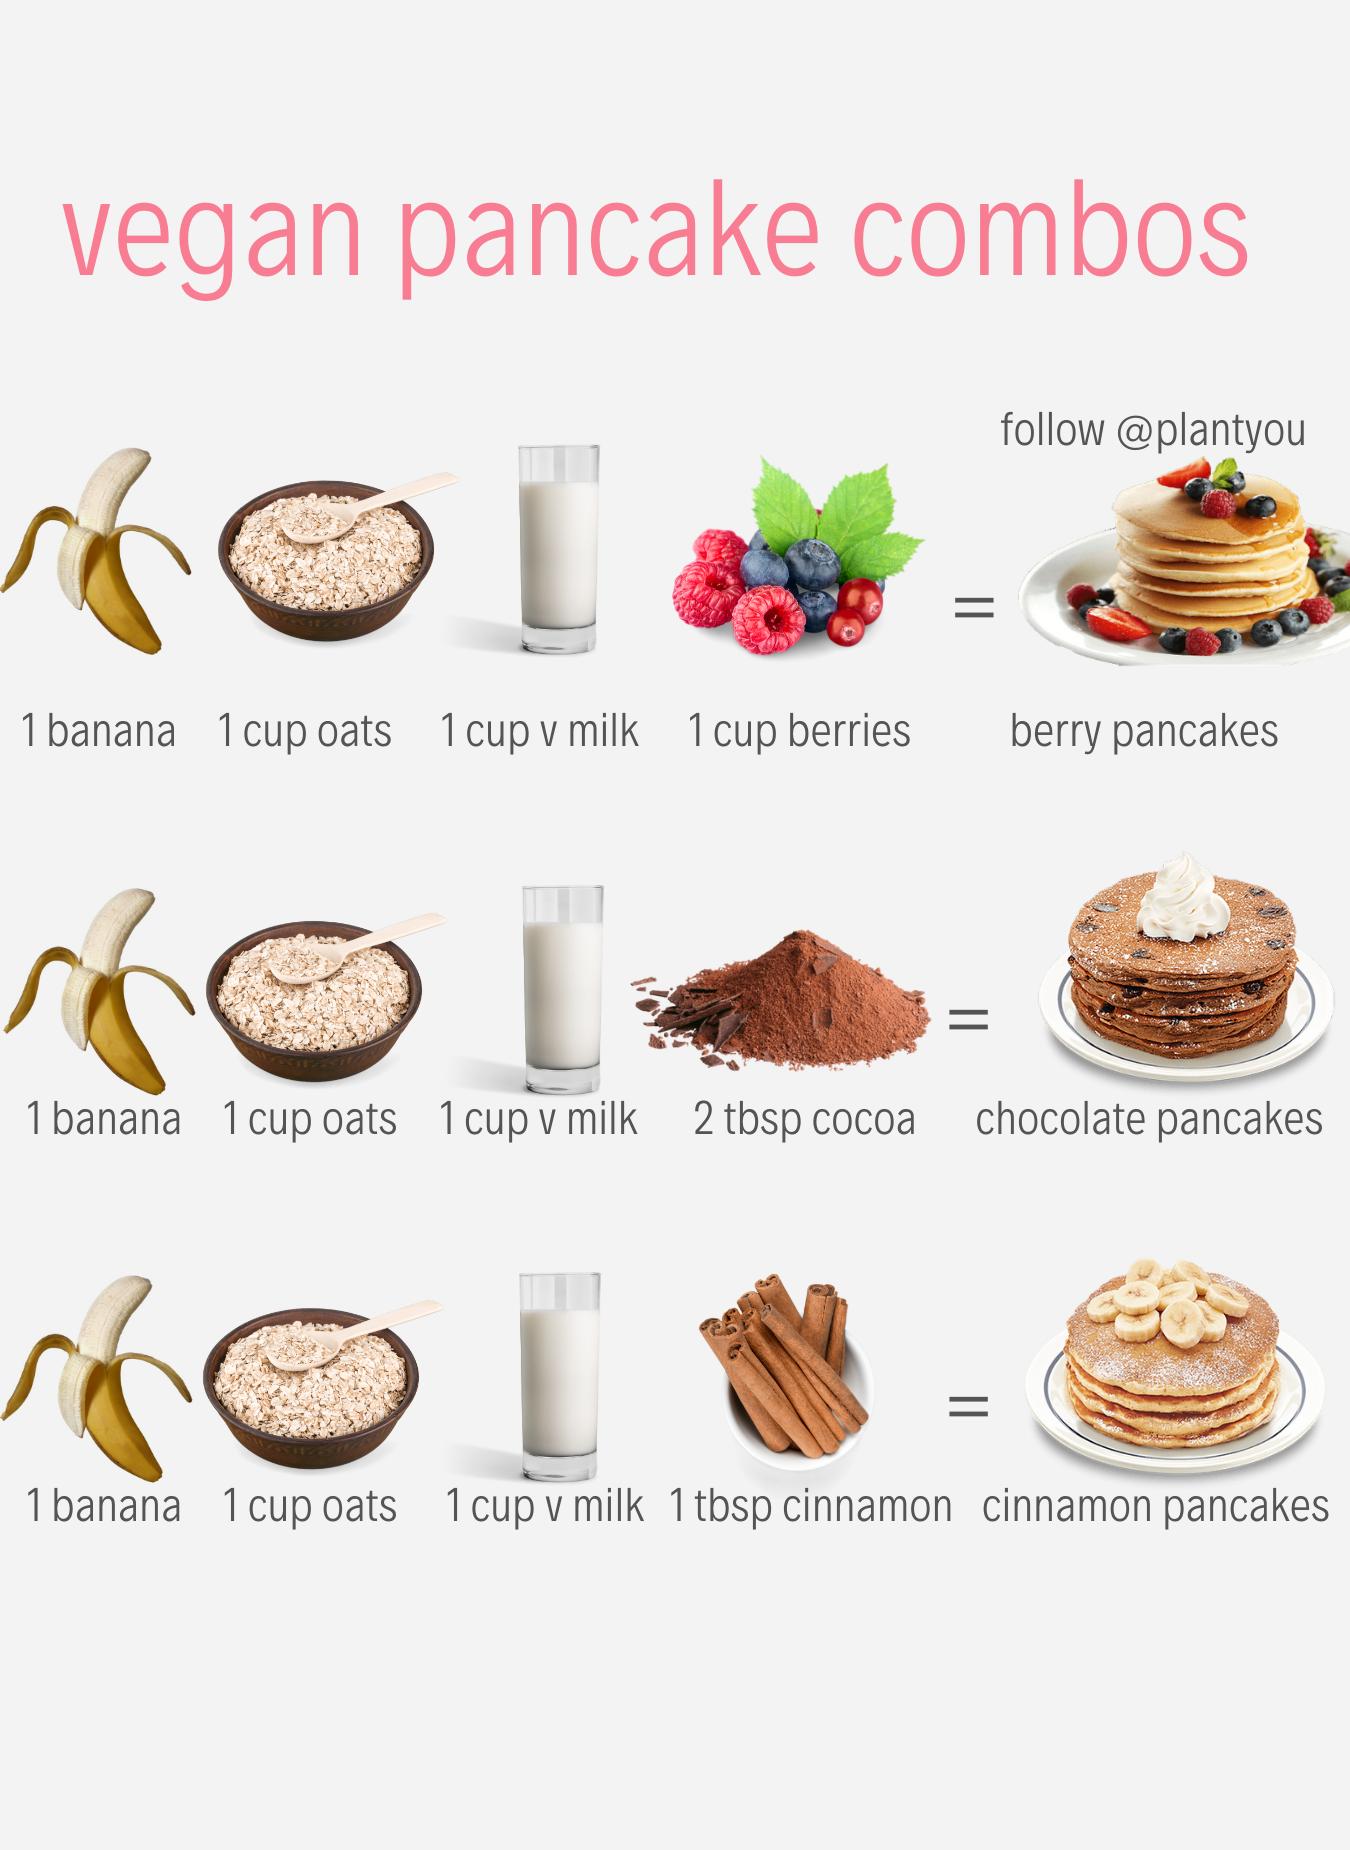 Vegan Pancakes Vegan Pancake Recipe Ideas Banana Pancake Recipes In 2020 Vegan Pancake Recipes Good Healthy Recipes Healthy Snacks Recipes